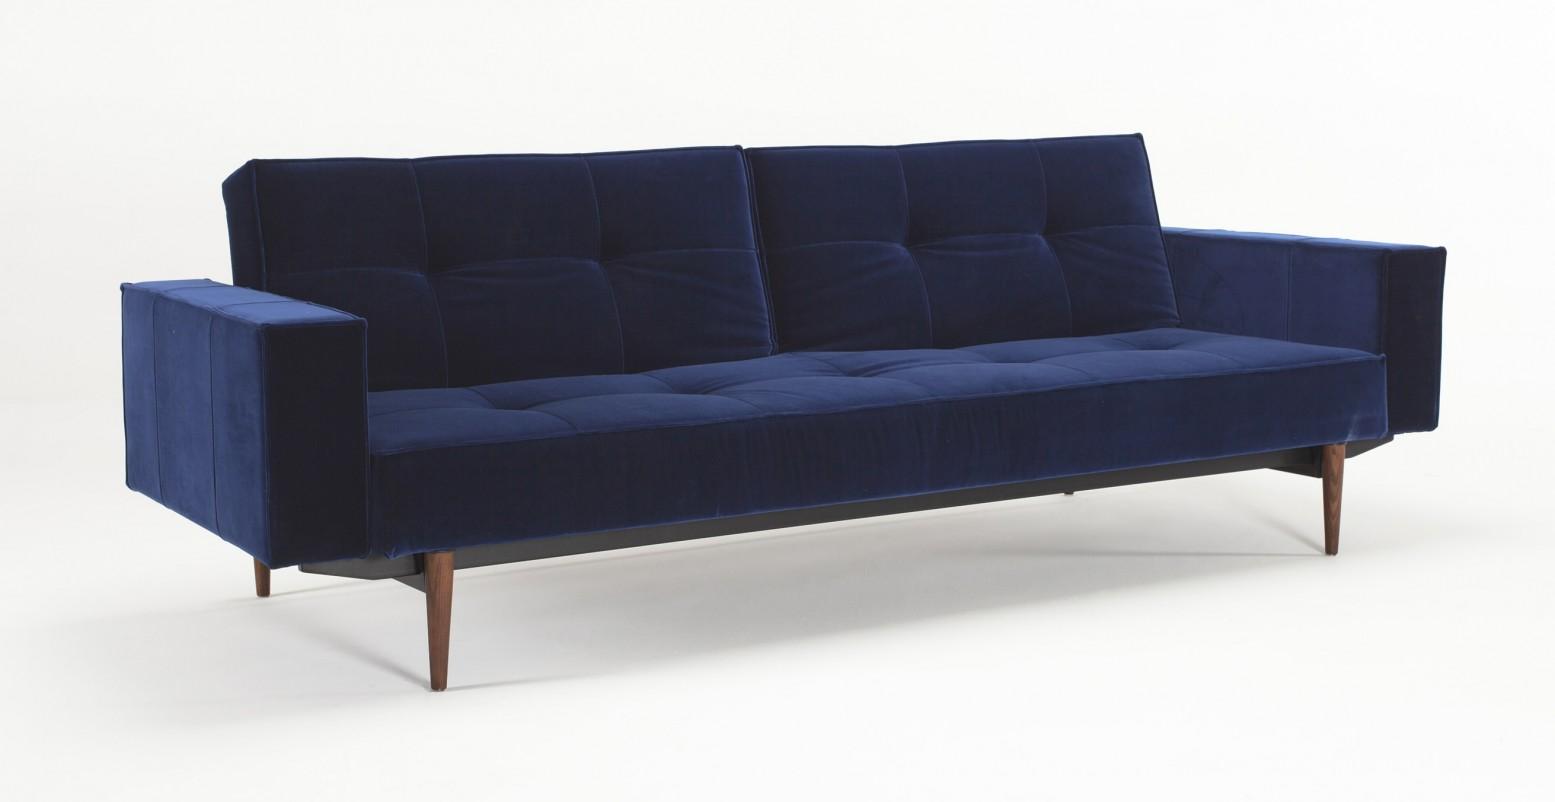 Outstanding Splitback Sofa Bed W Arms 865 Vintage Velvet Blue Dark Wood Legs Ibusinesslaw Wood Chair Design Ideas Ibusinesslaworg